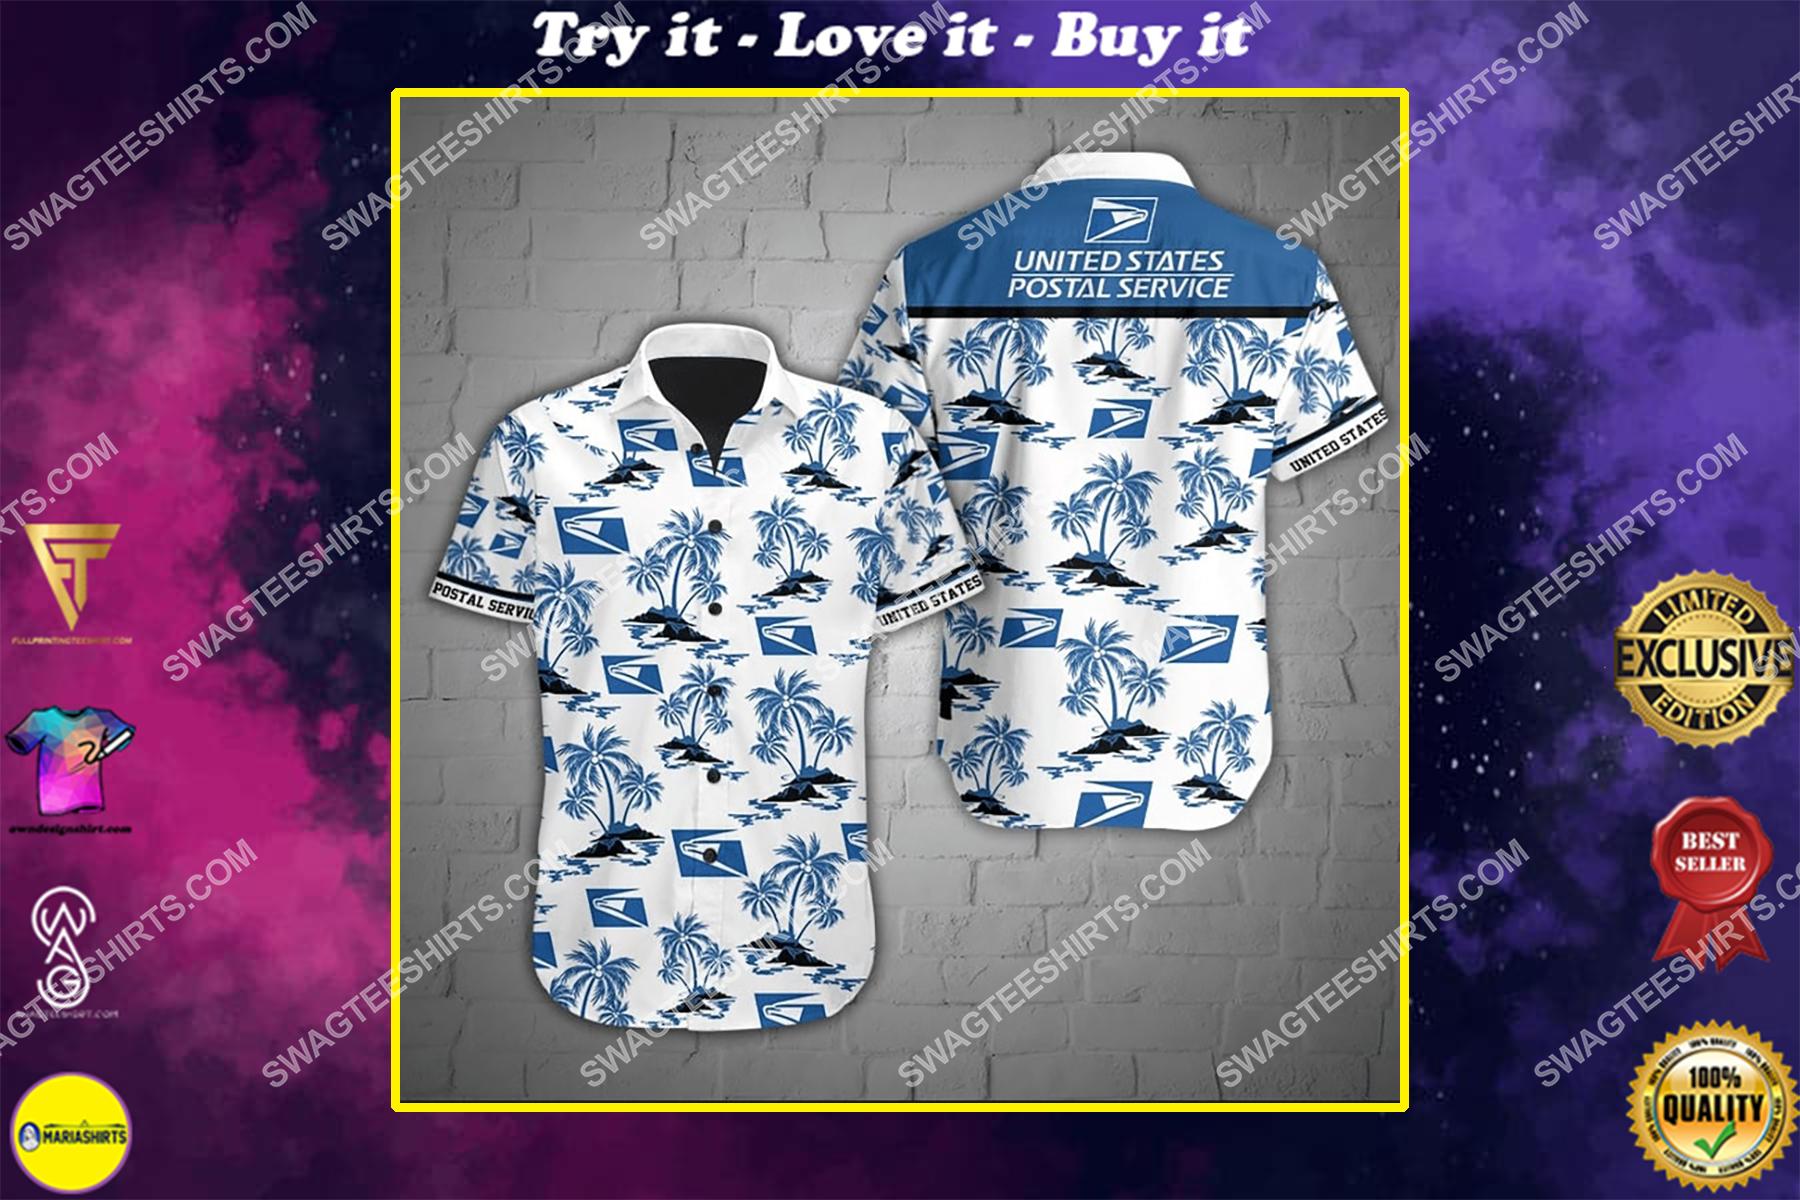 united states postal service full printing hawaiian shirt